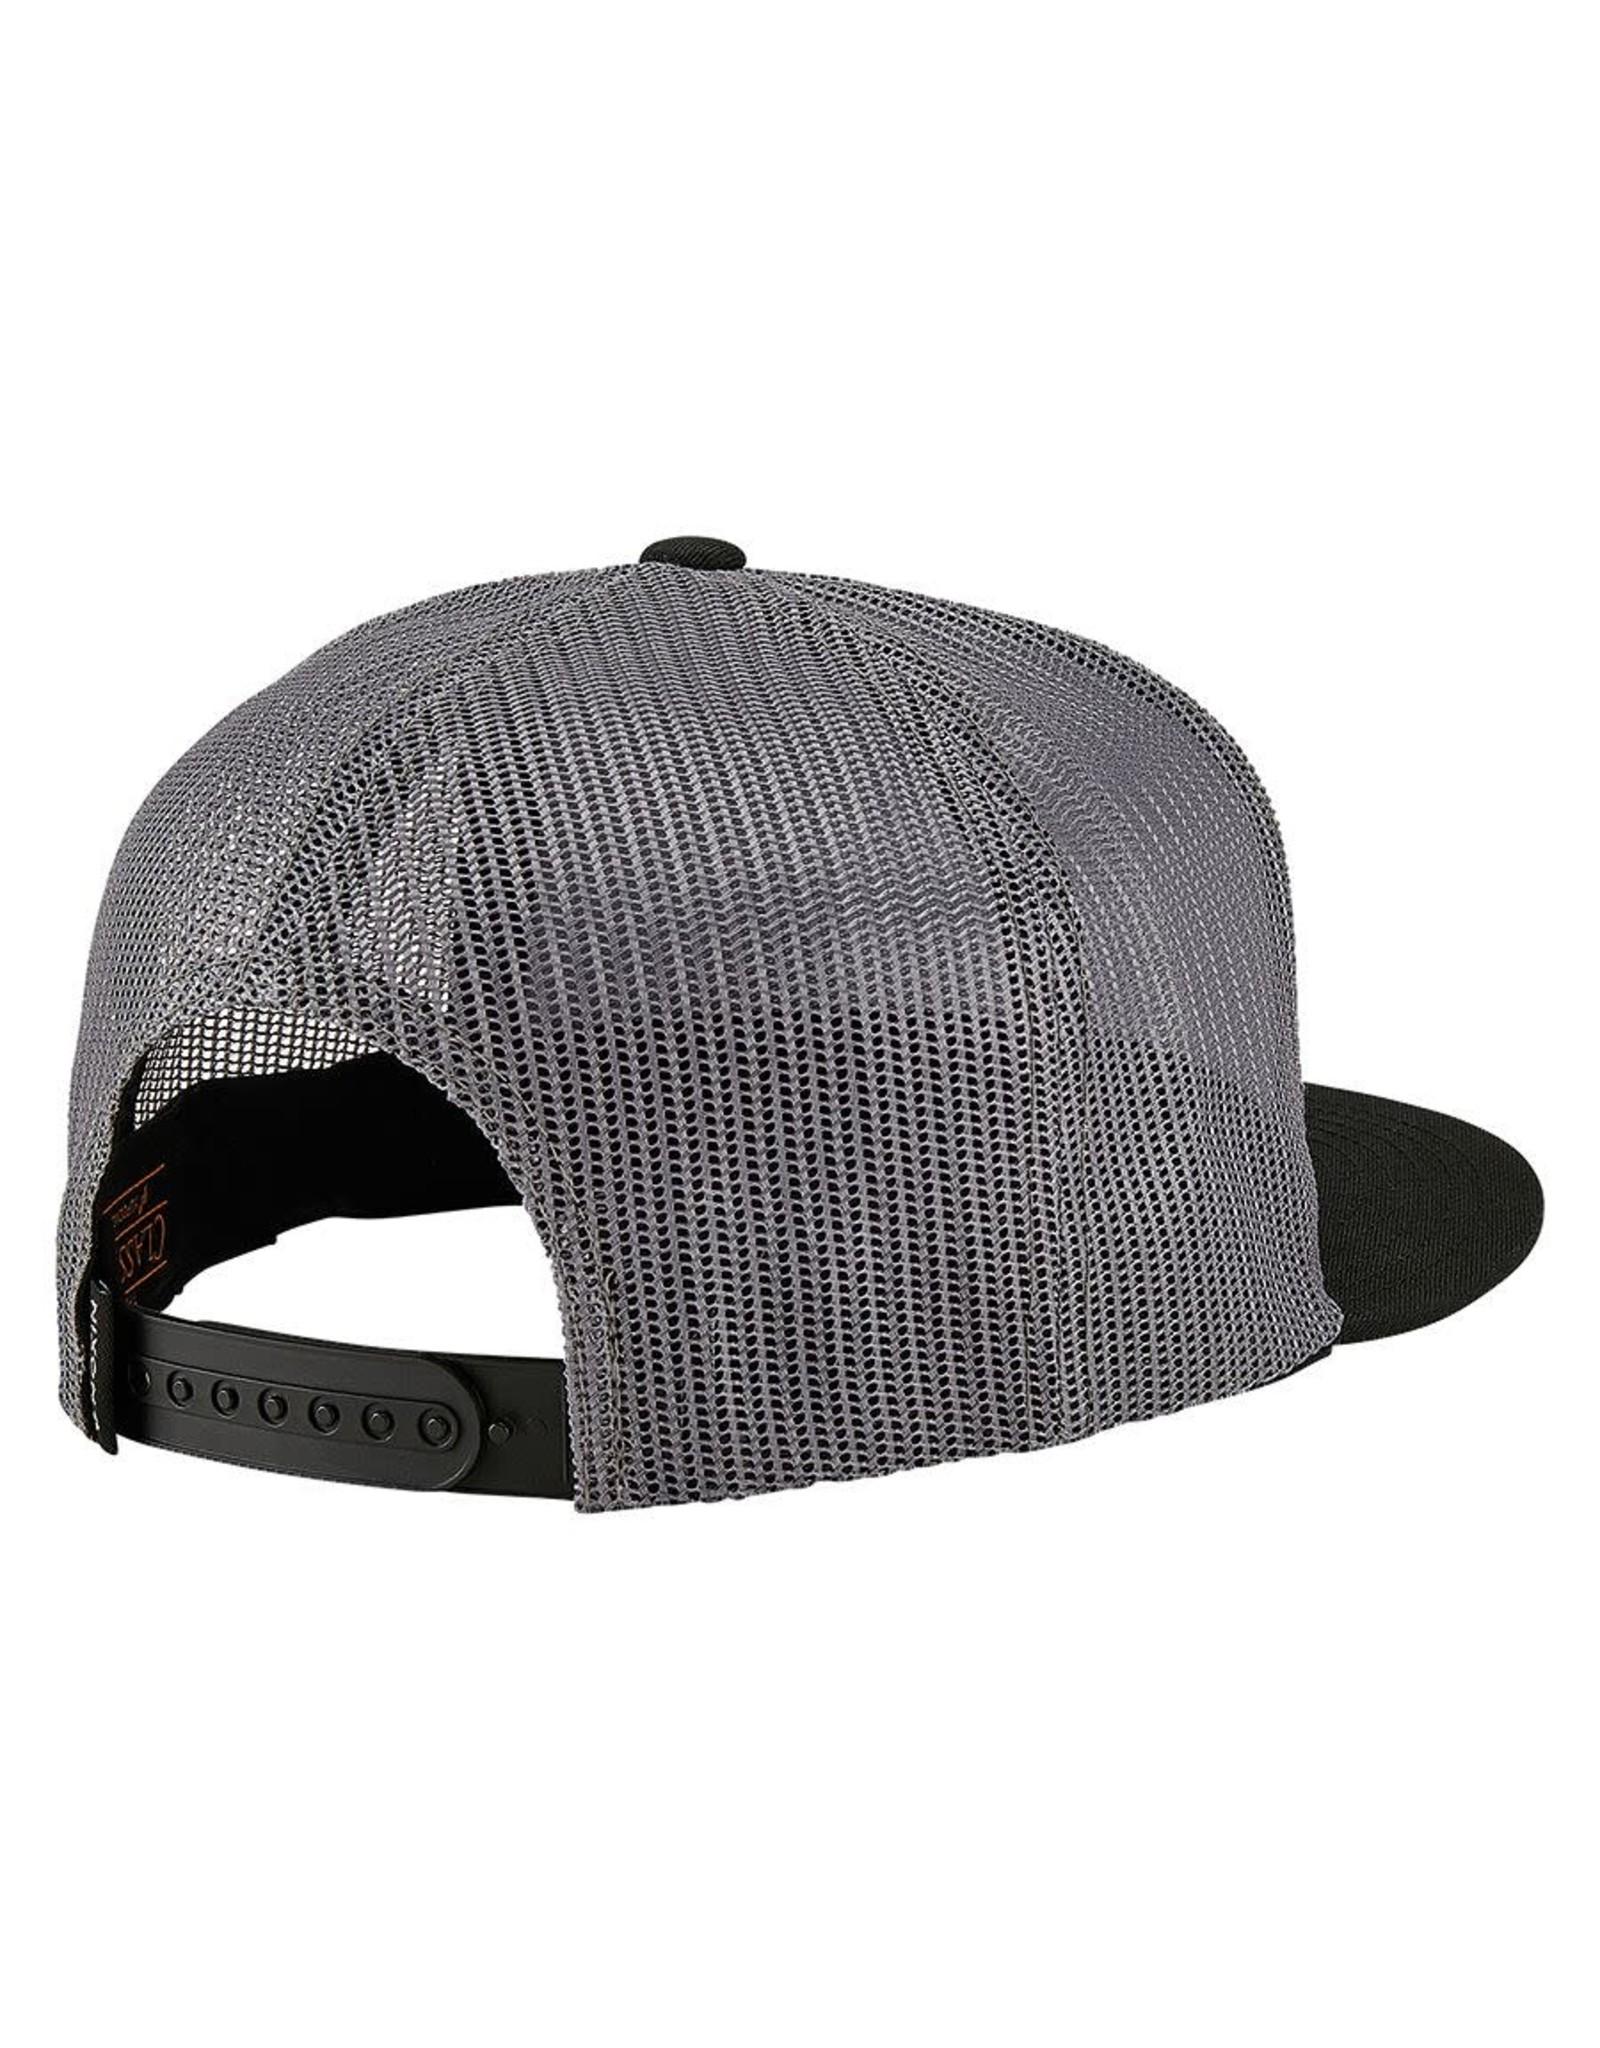 NIXON TEAM TRUCKER snapback hat, BLK/ GREY